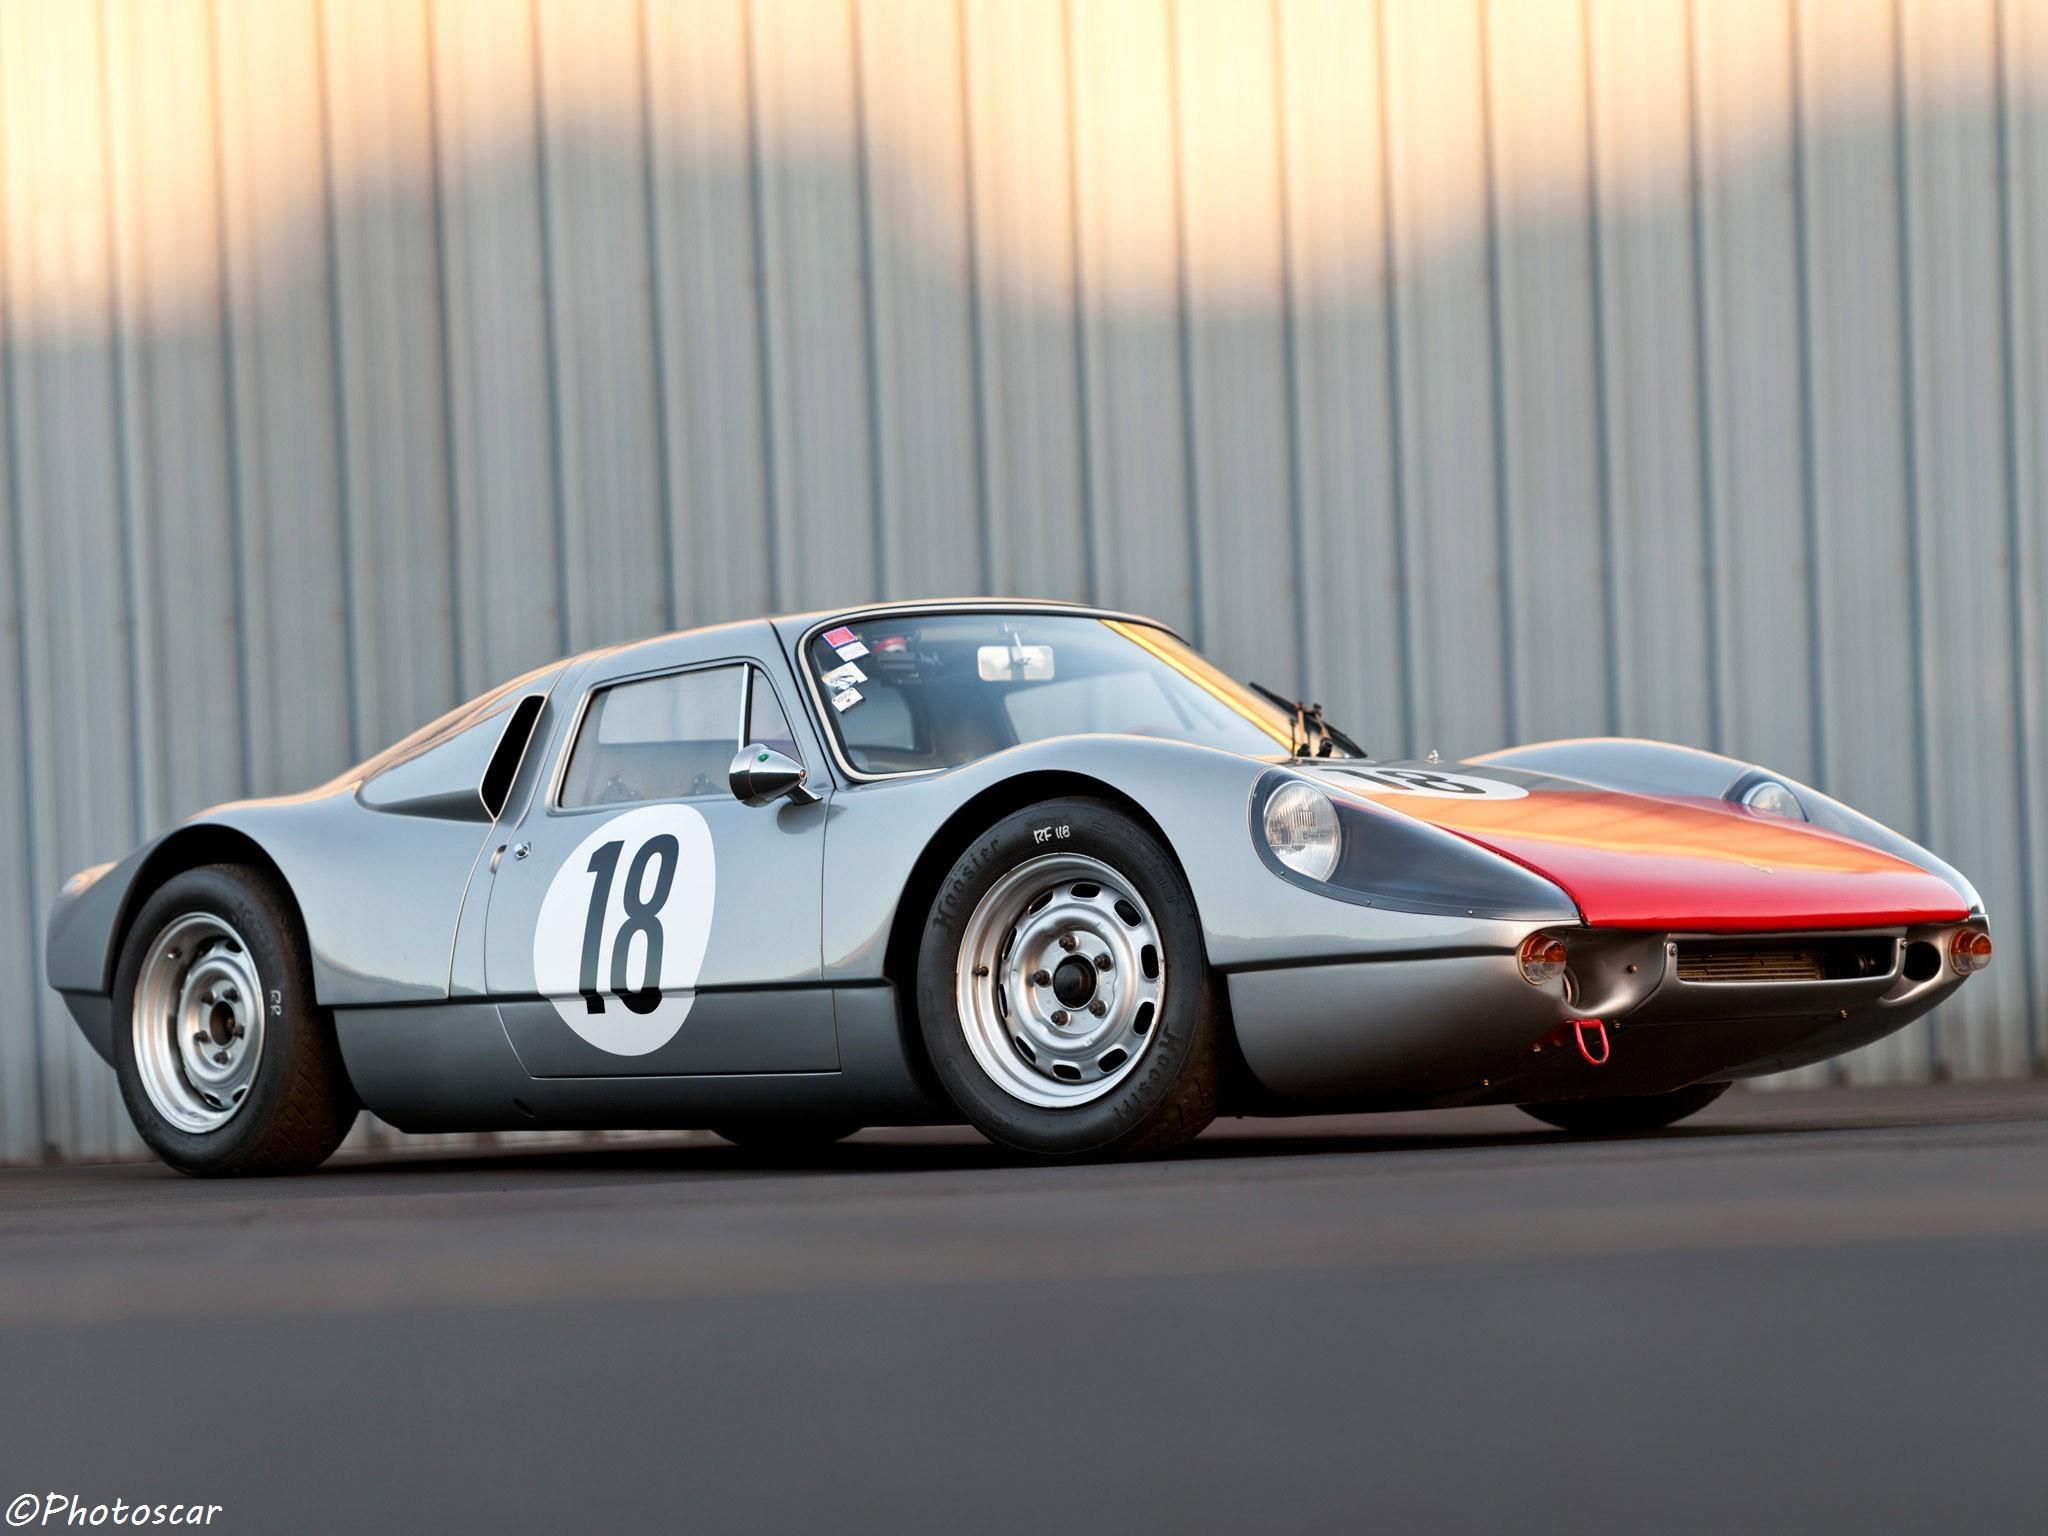 Porsche 904 GTS Carrera Prototype 1963